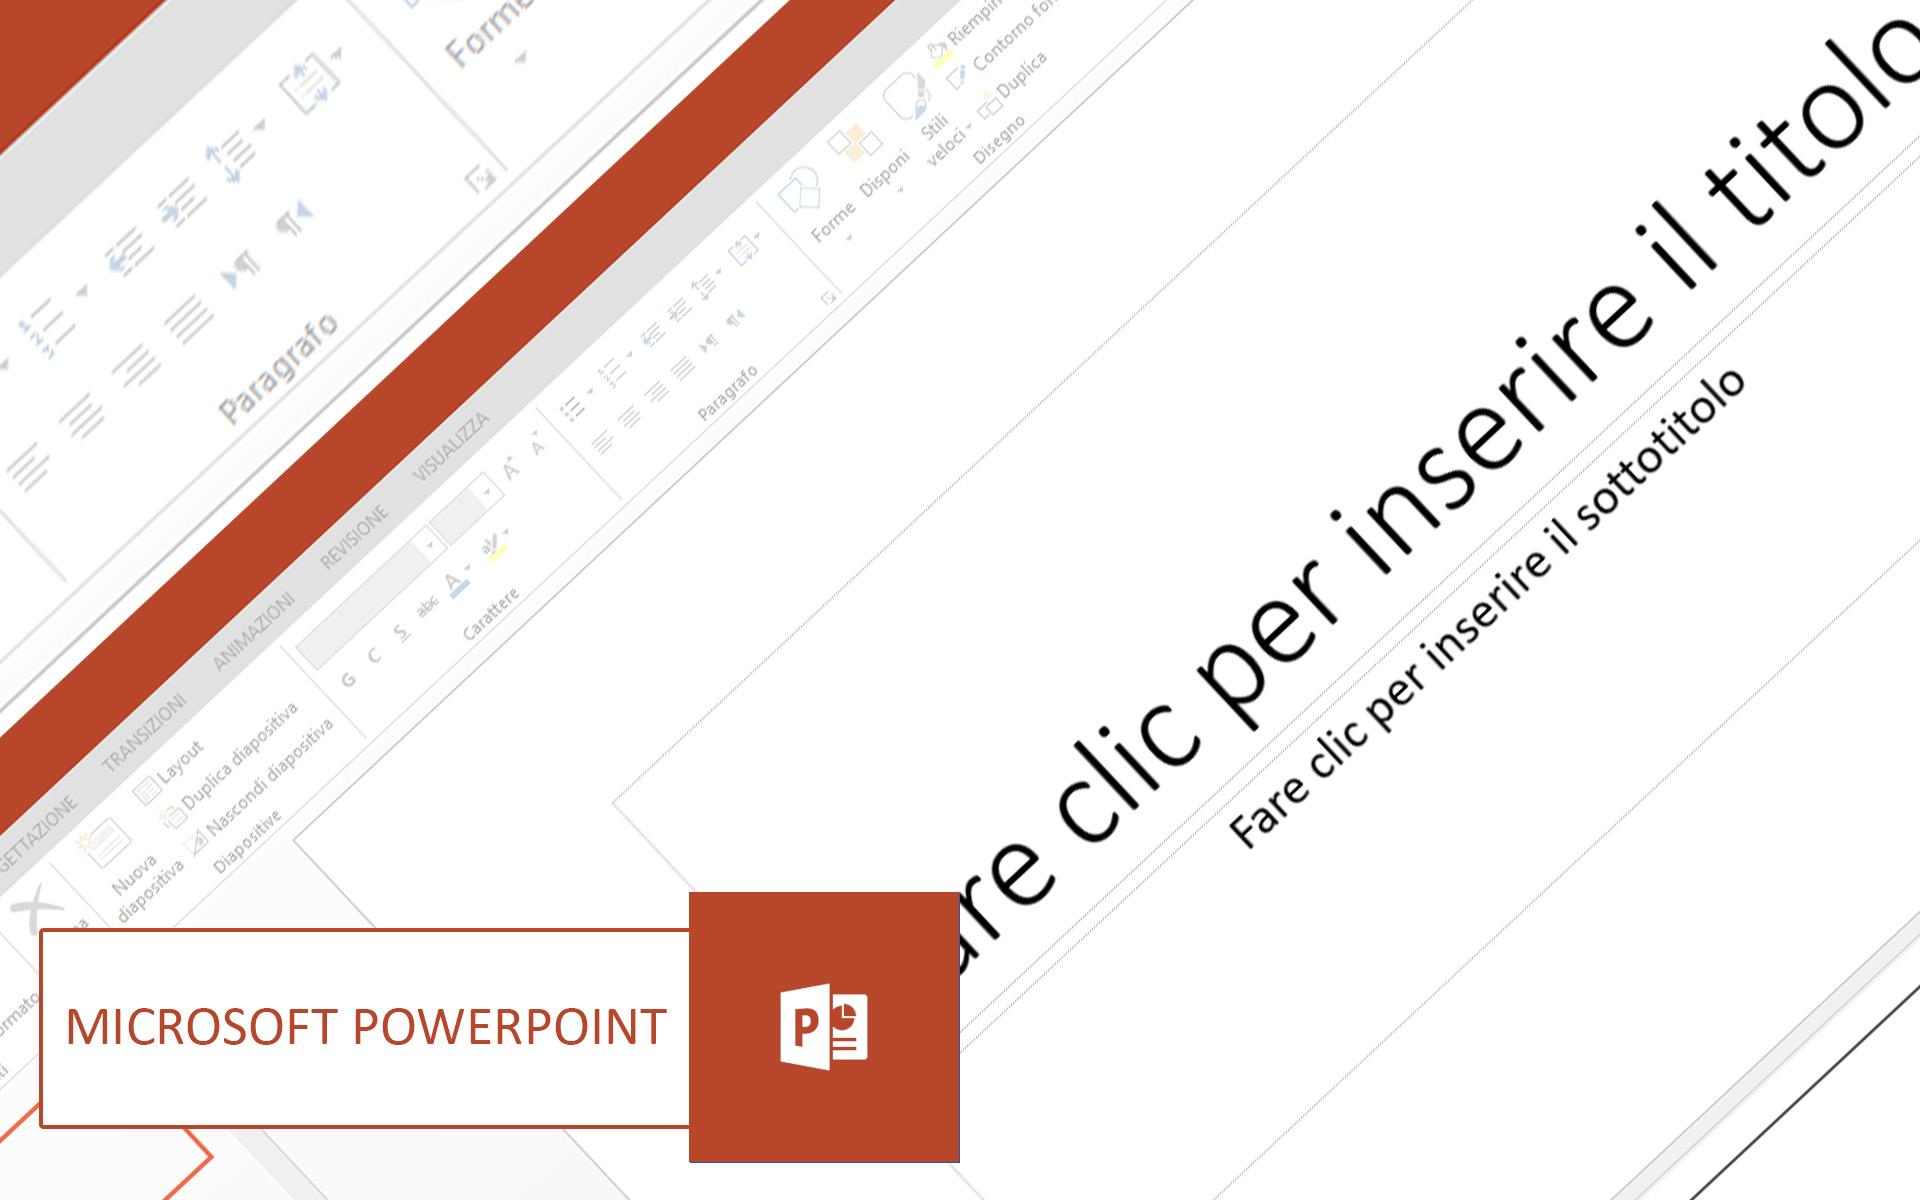 Come usare Microsoft PowerPoint online Gratis senza installare programmi